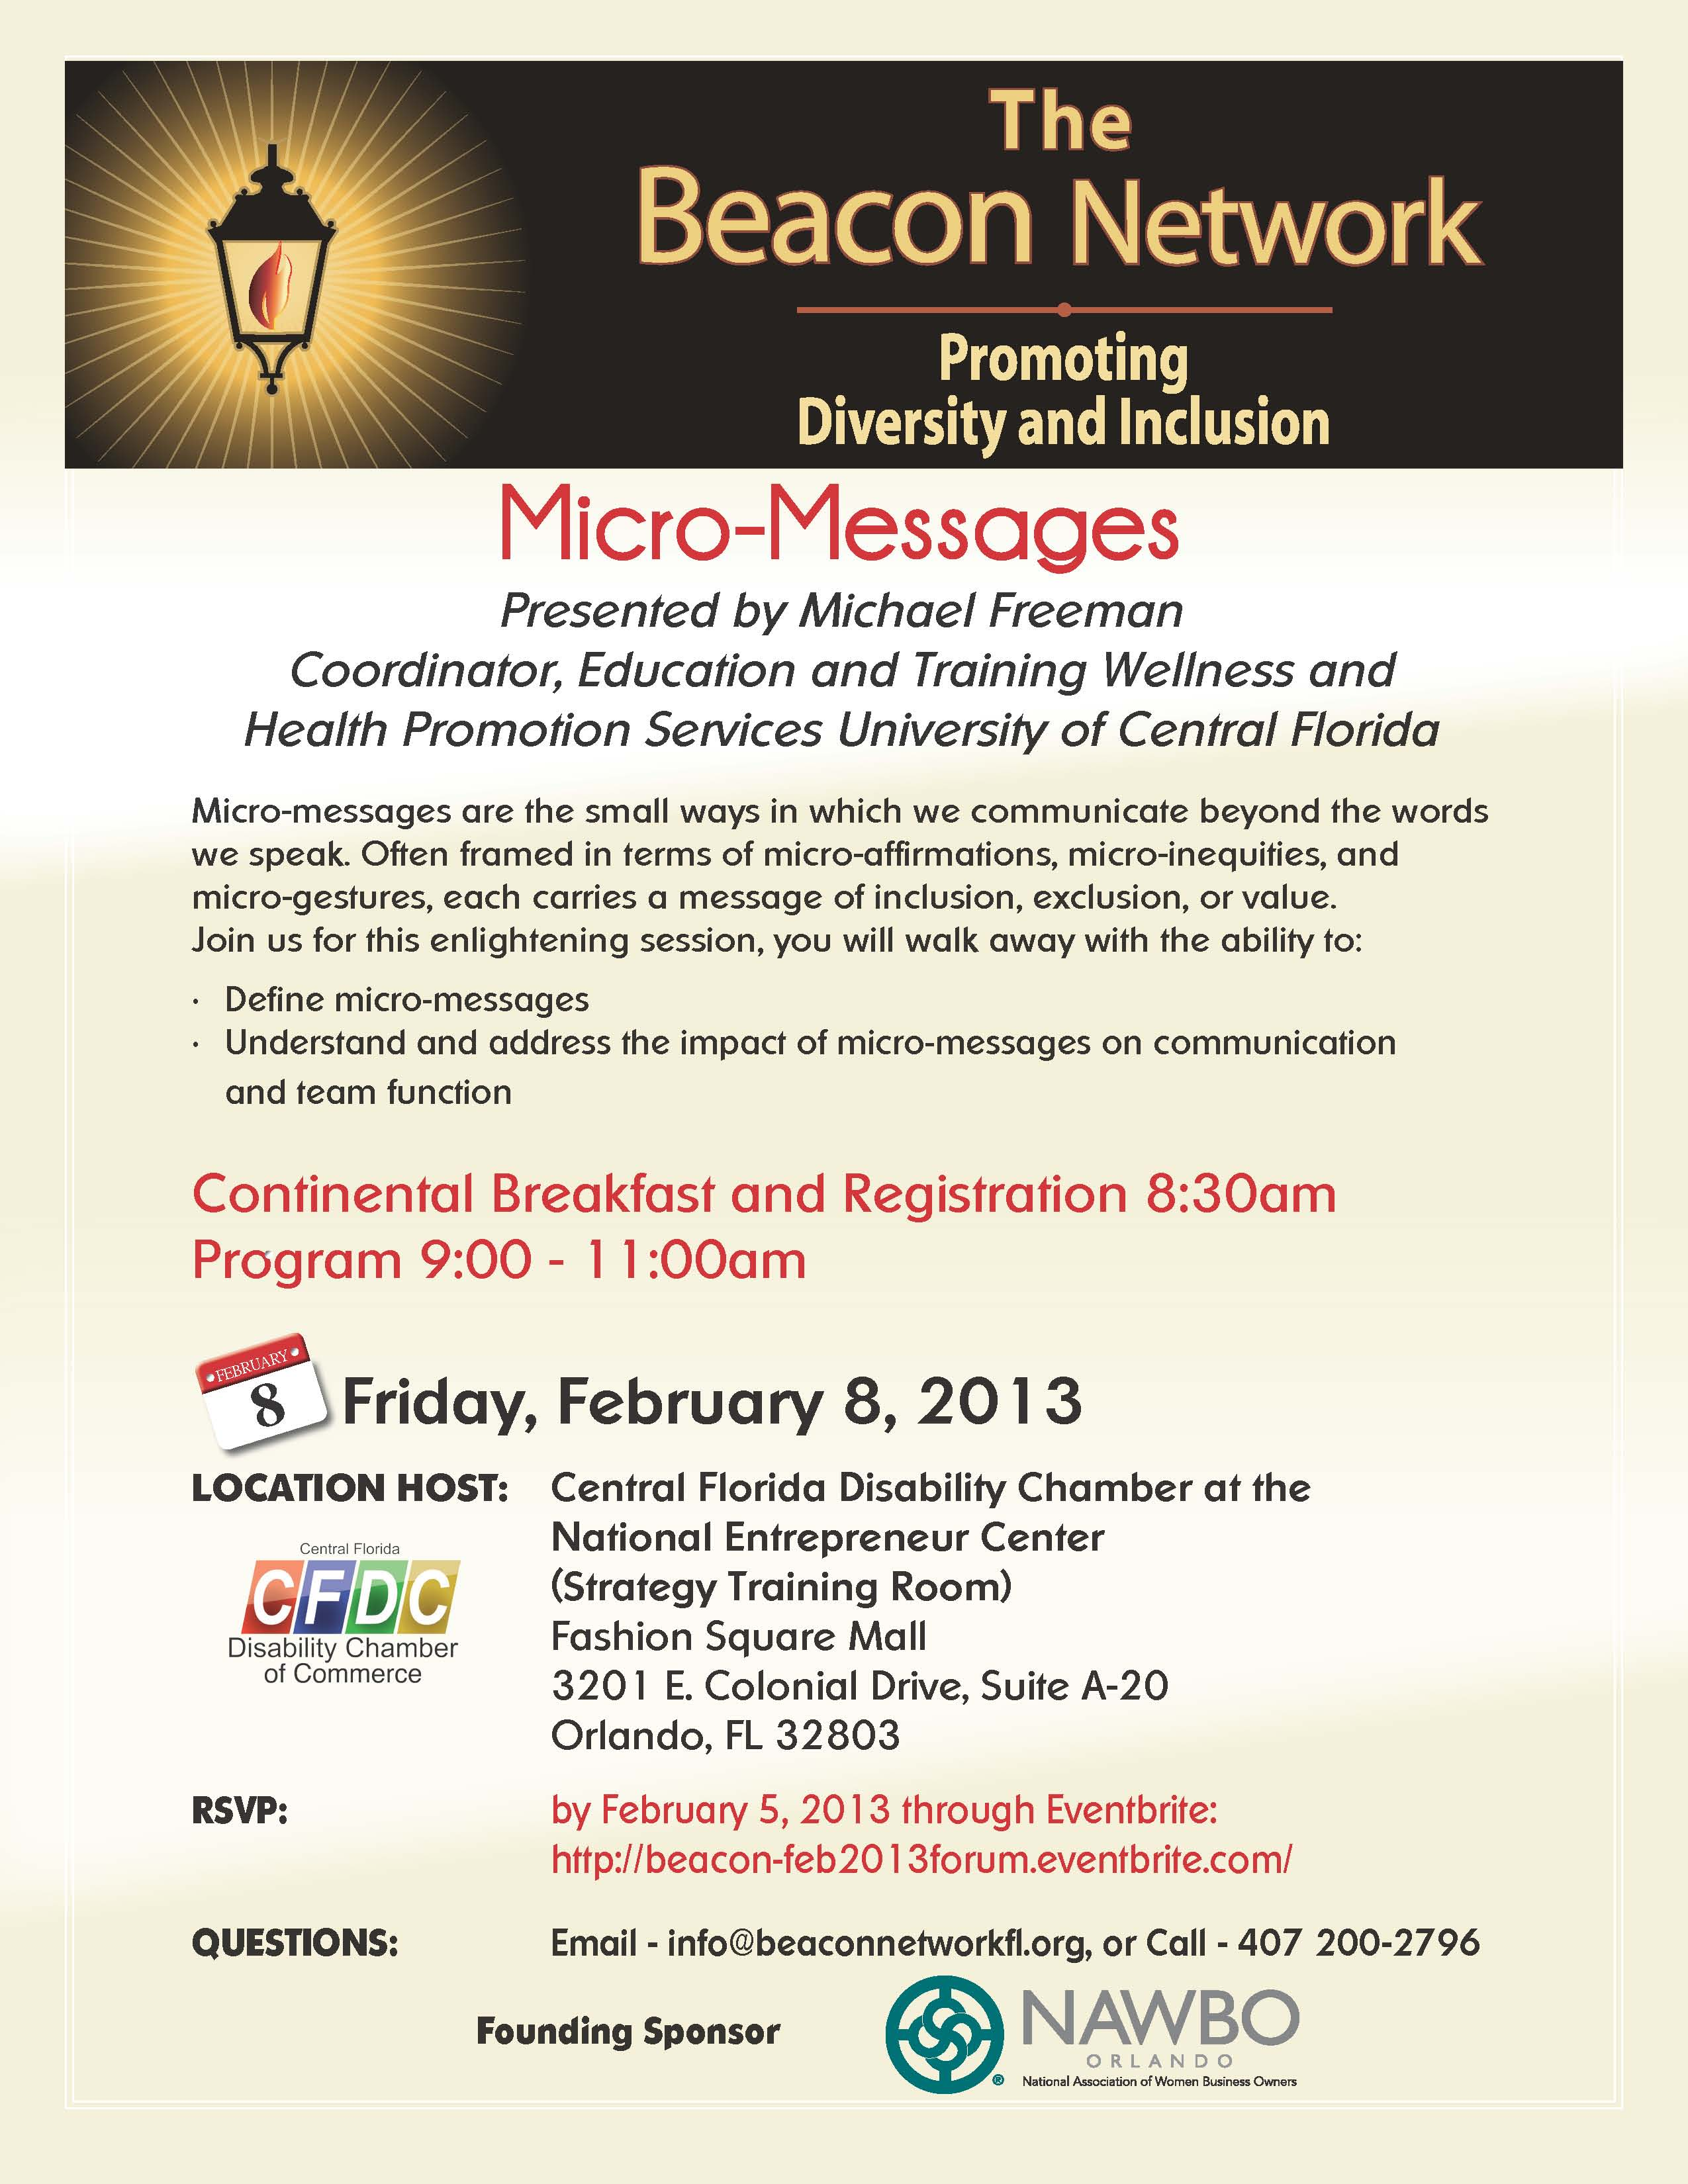 Beacon Forum February 8, 2013 Flyer Image